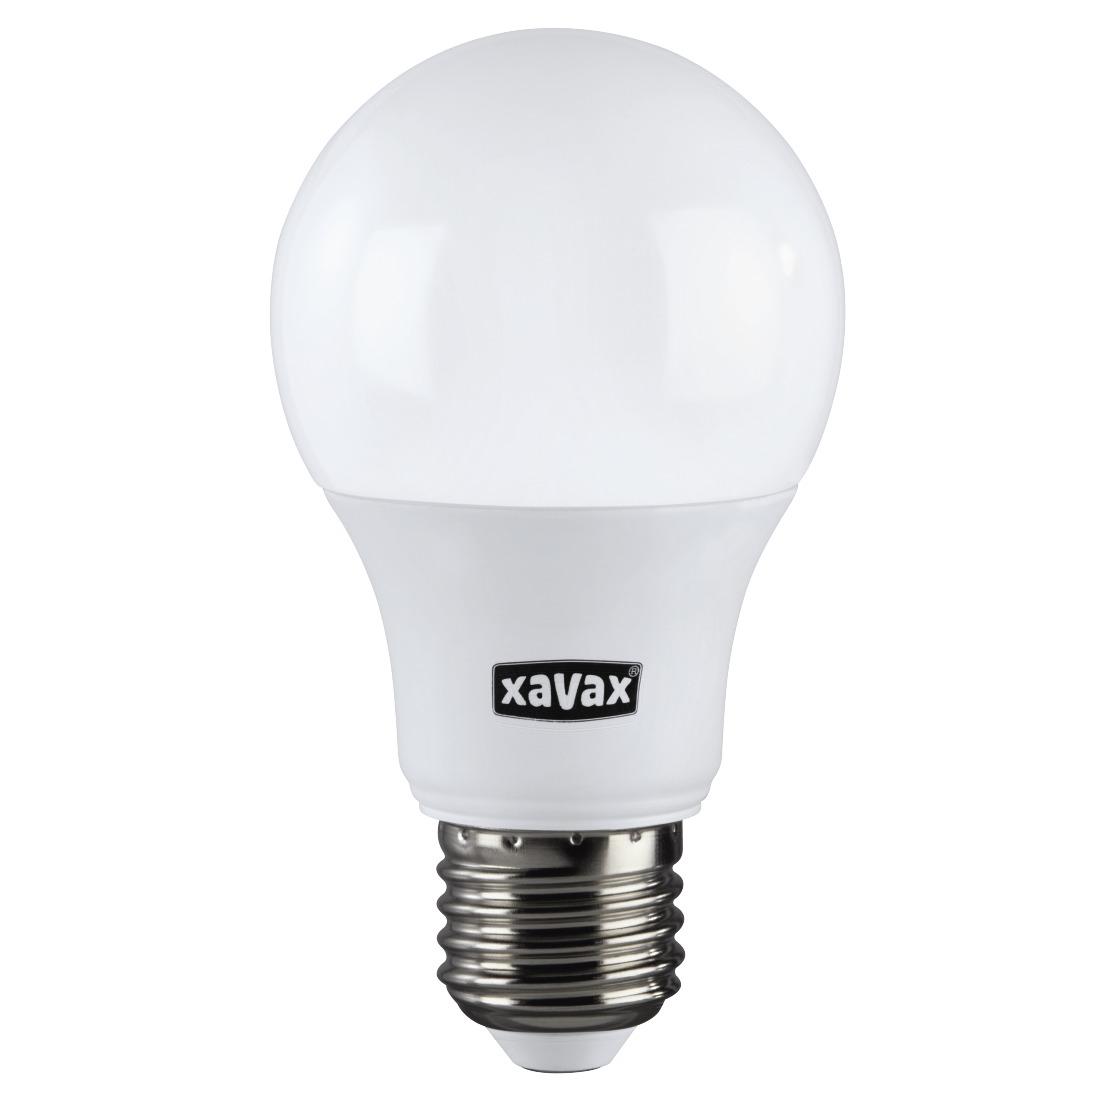 Korting Xavax LED LAMP, 6W, GLOEILAMPVORM, E27, WARM